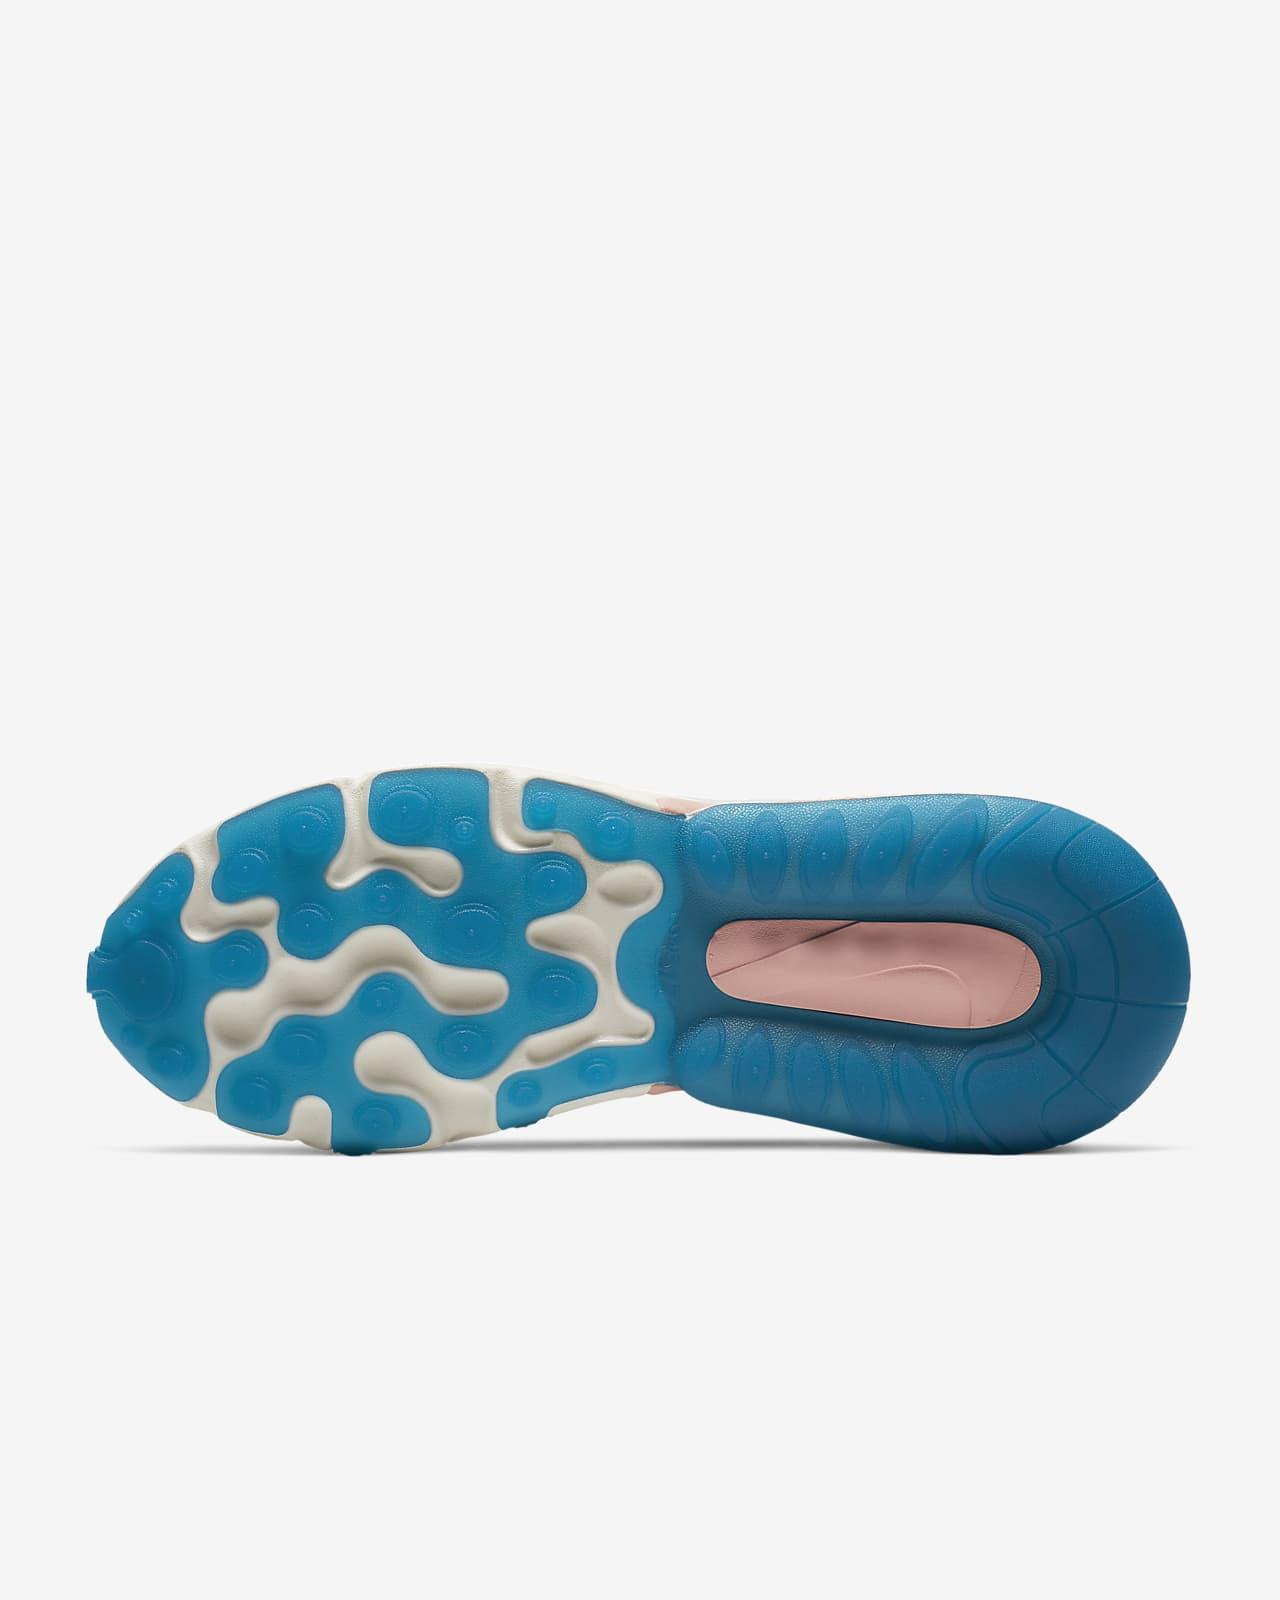 turquoise nike air max 270 womens blue